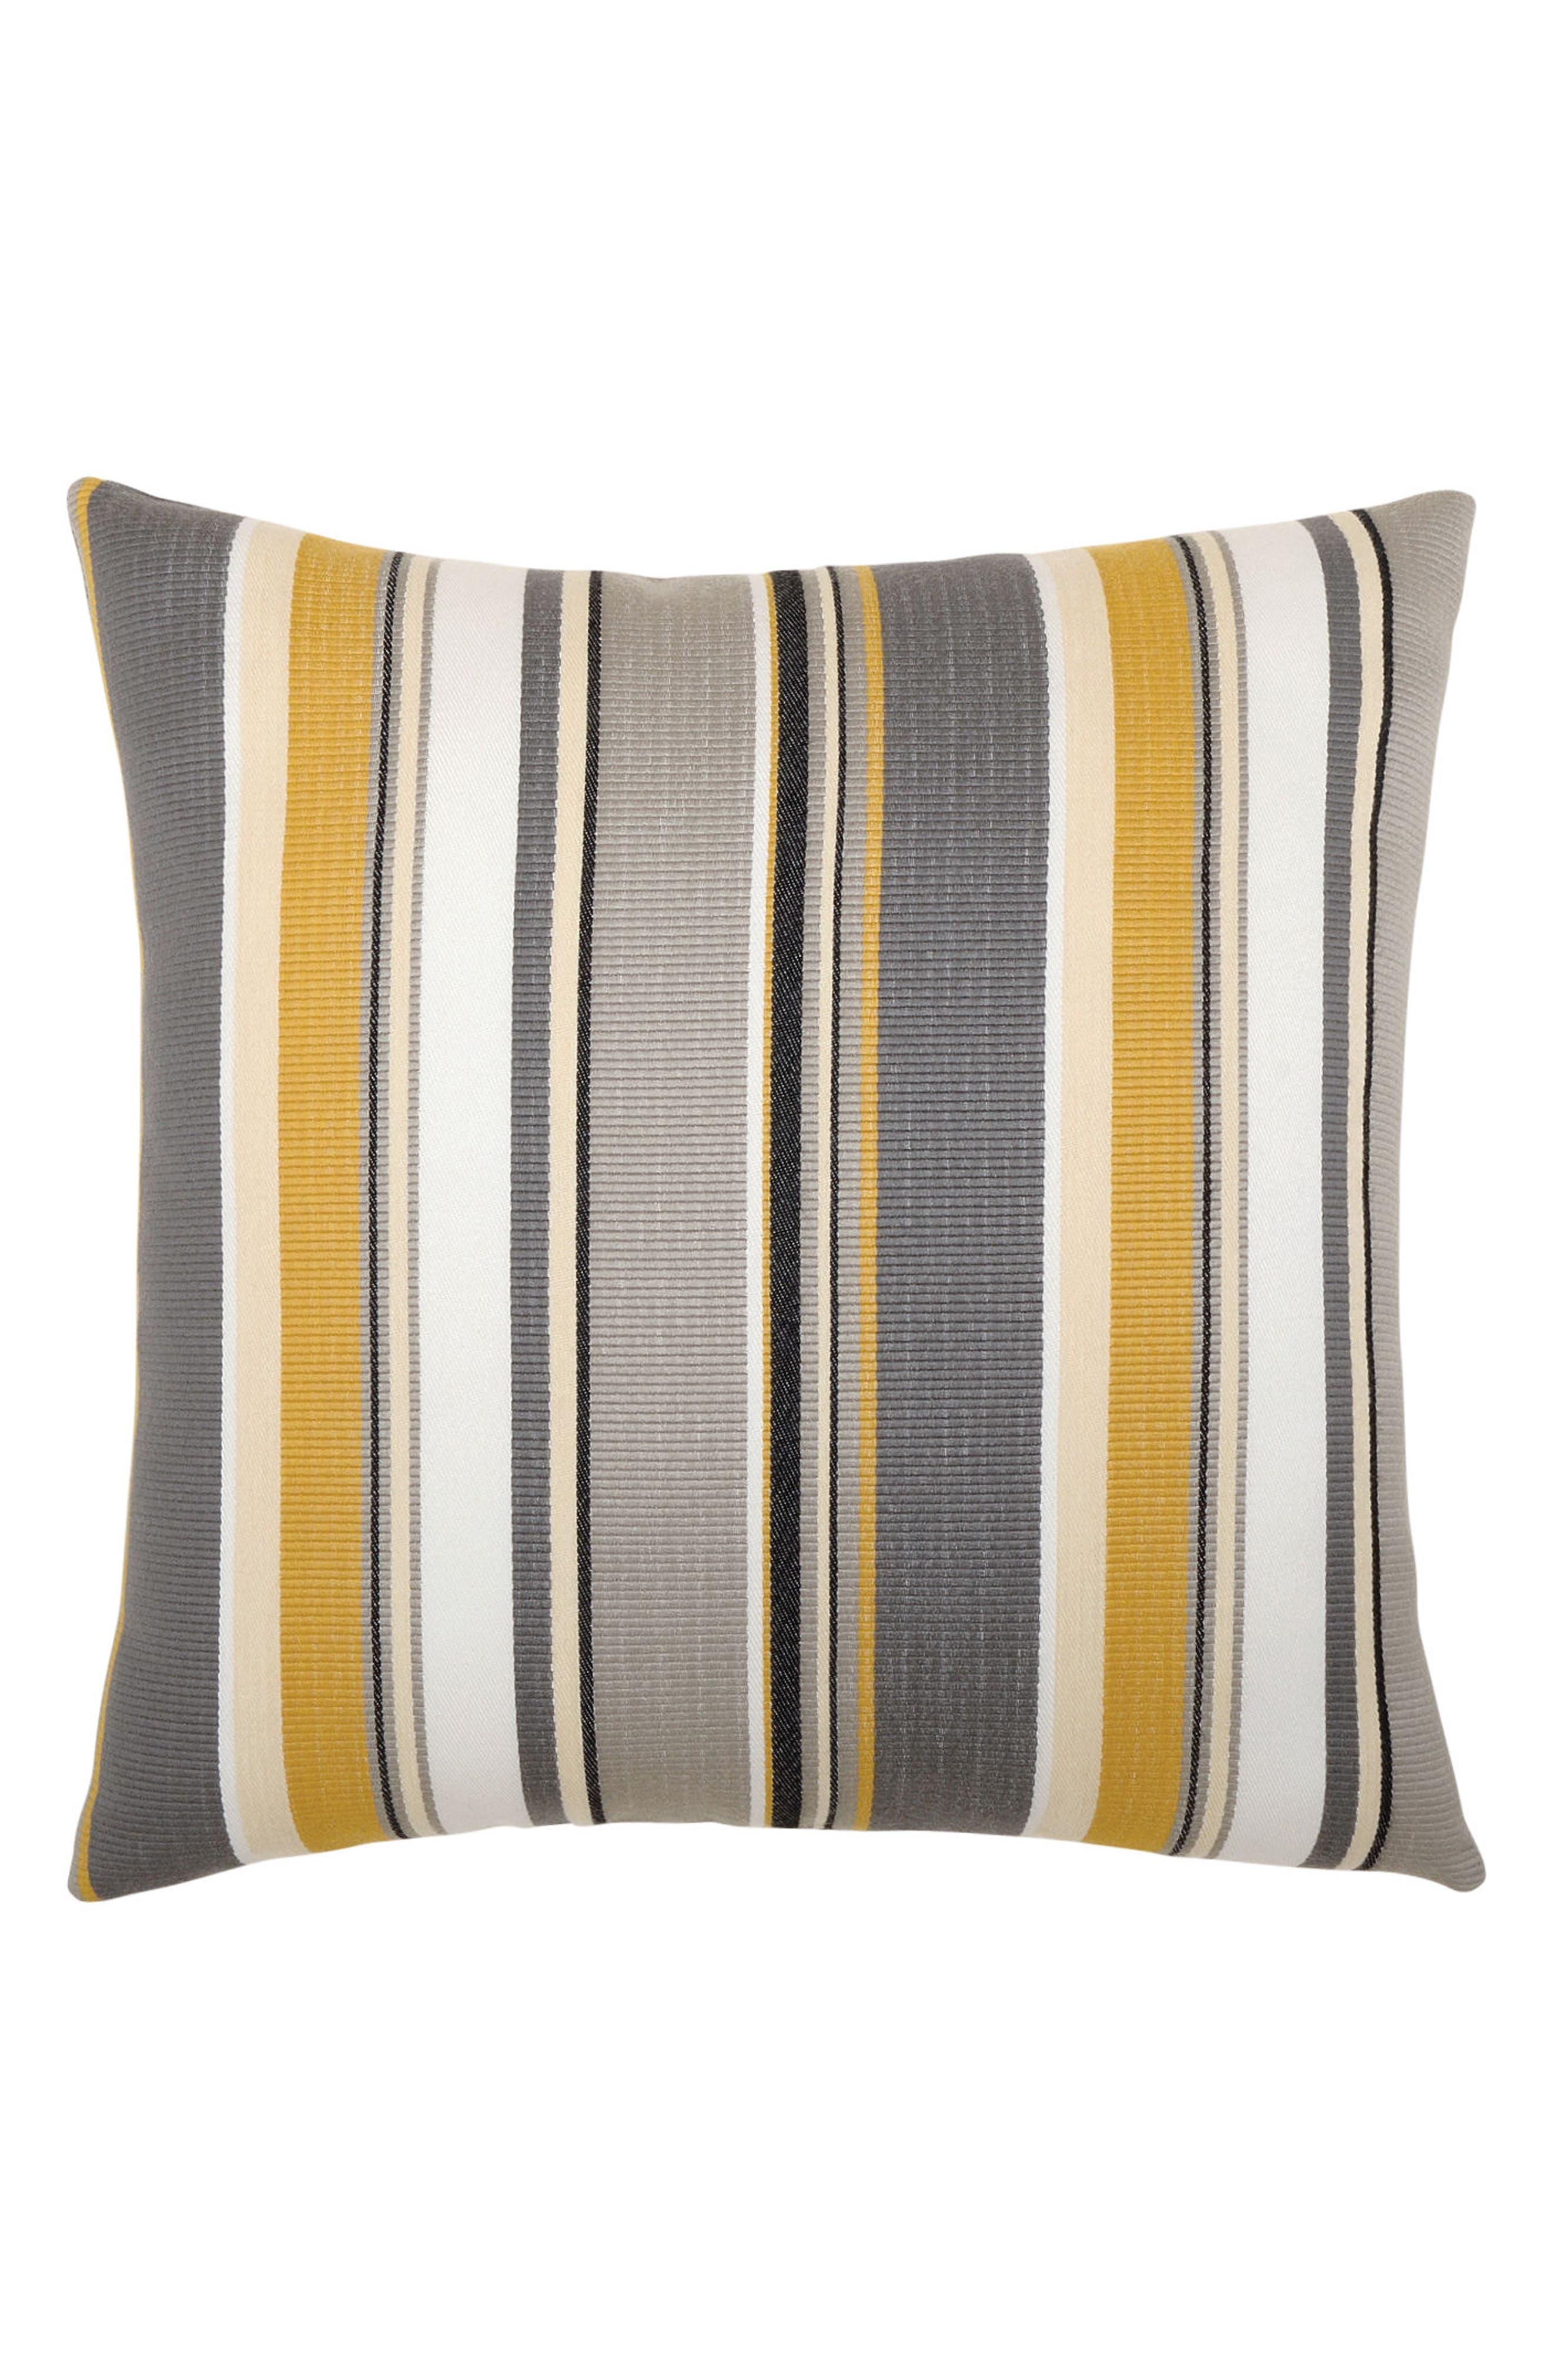 Shadow Stripe Indoor/Outdoor Accent Pillow,                         Main,                         color, 020